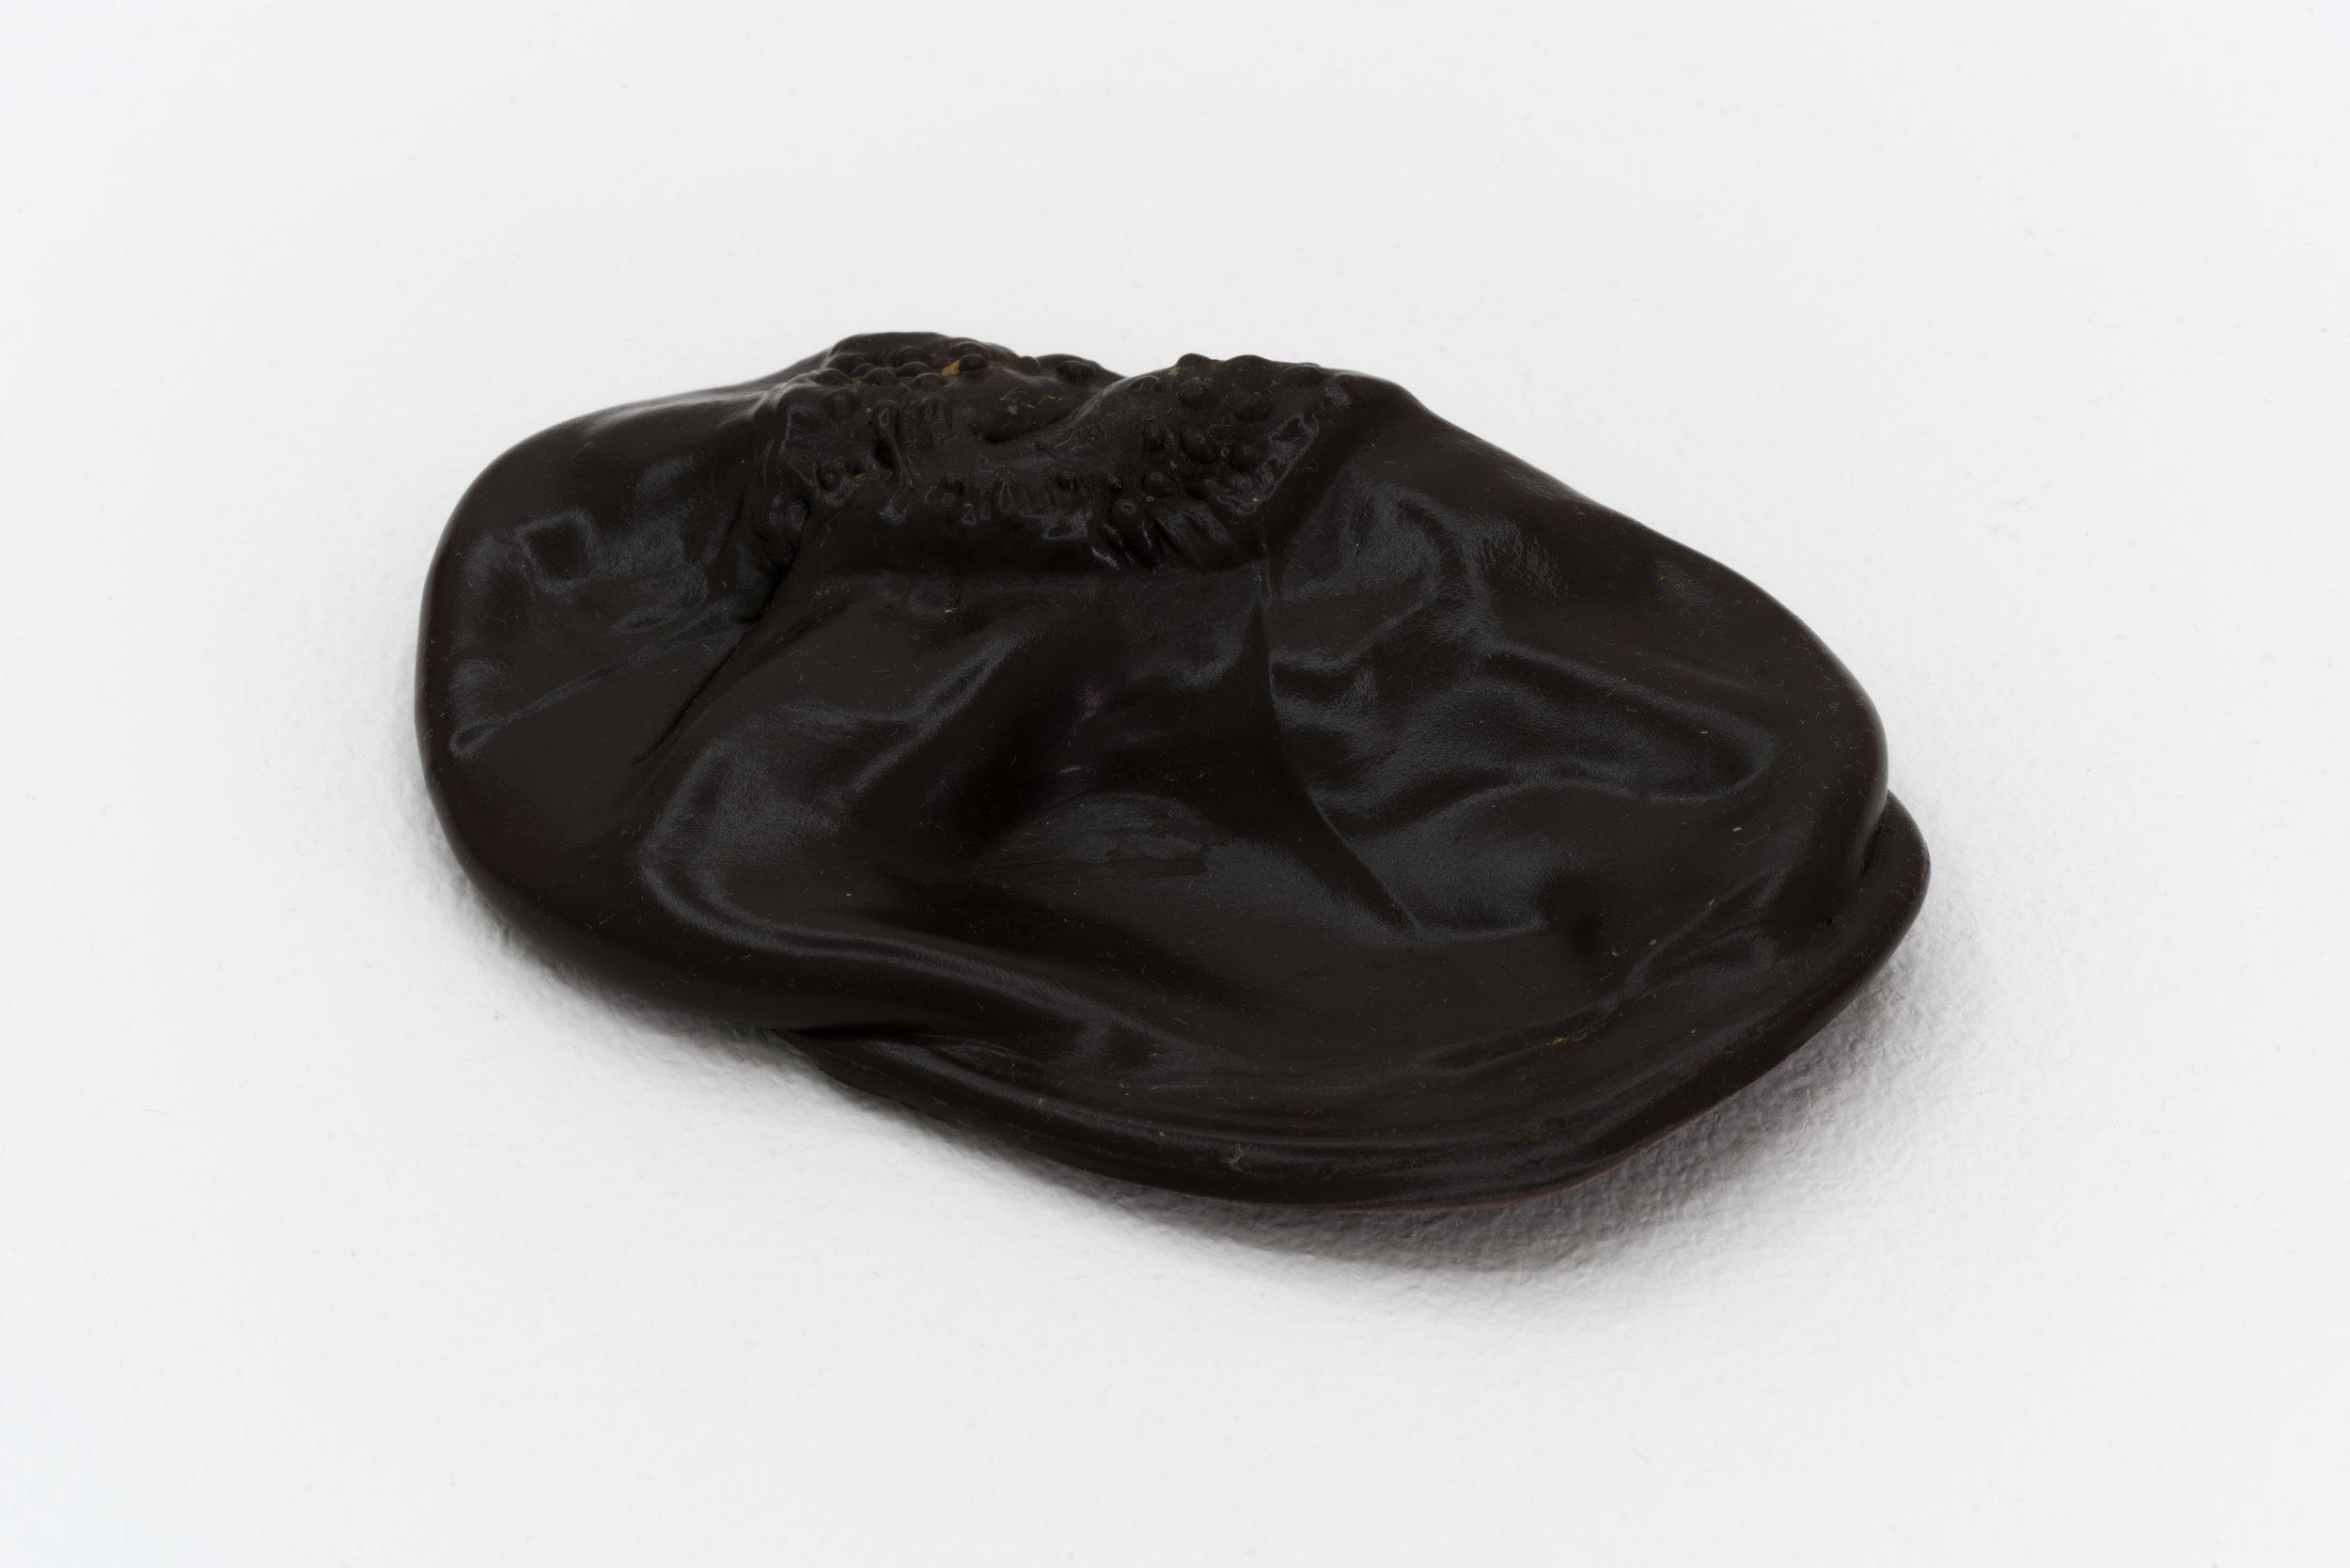 Remko Scha,  Plastic Meltdown , 1962-1992, Plastic, 1.5 x 11 x 7 cm